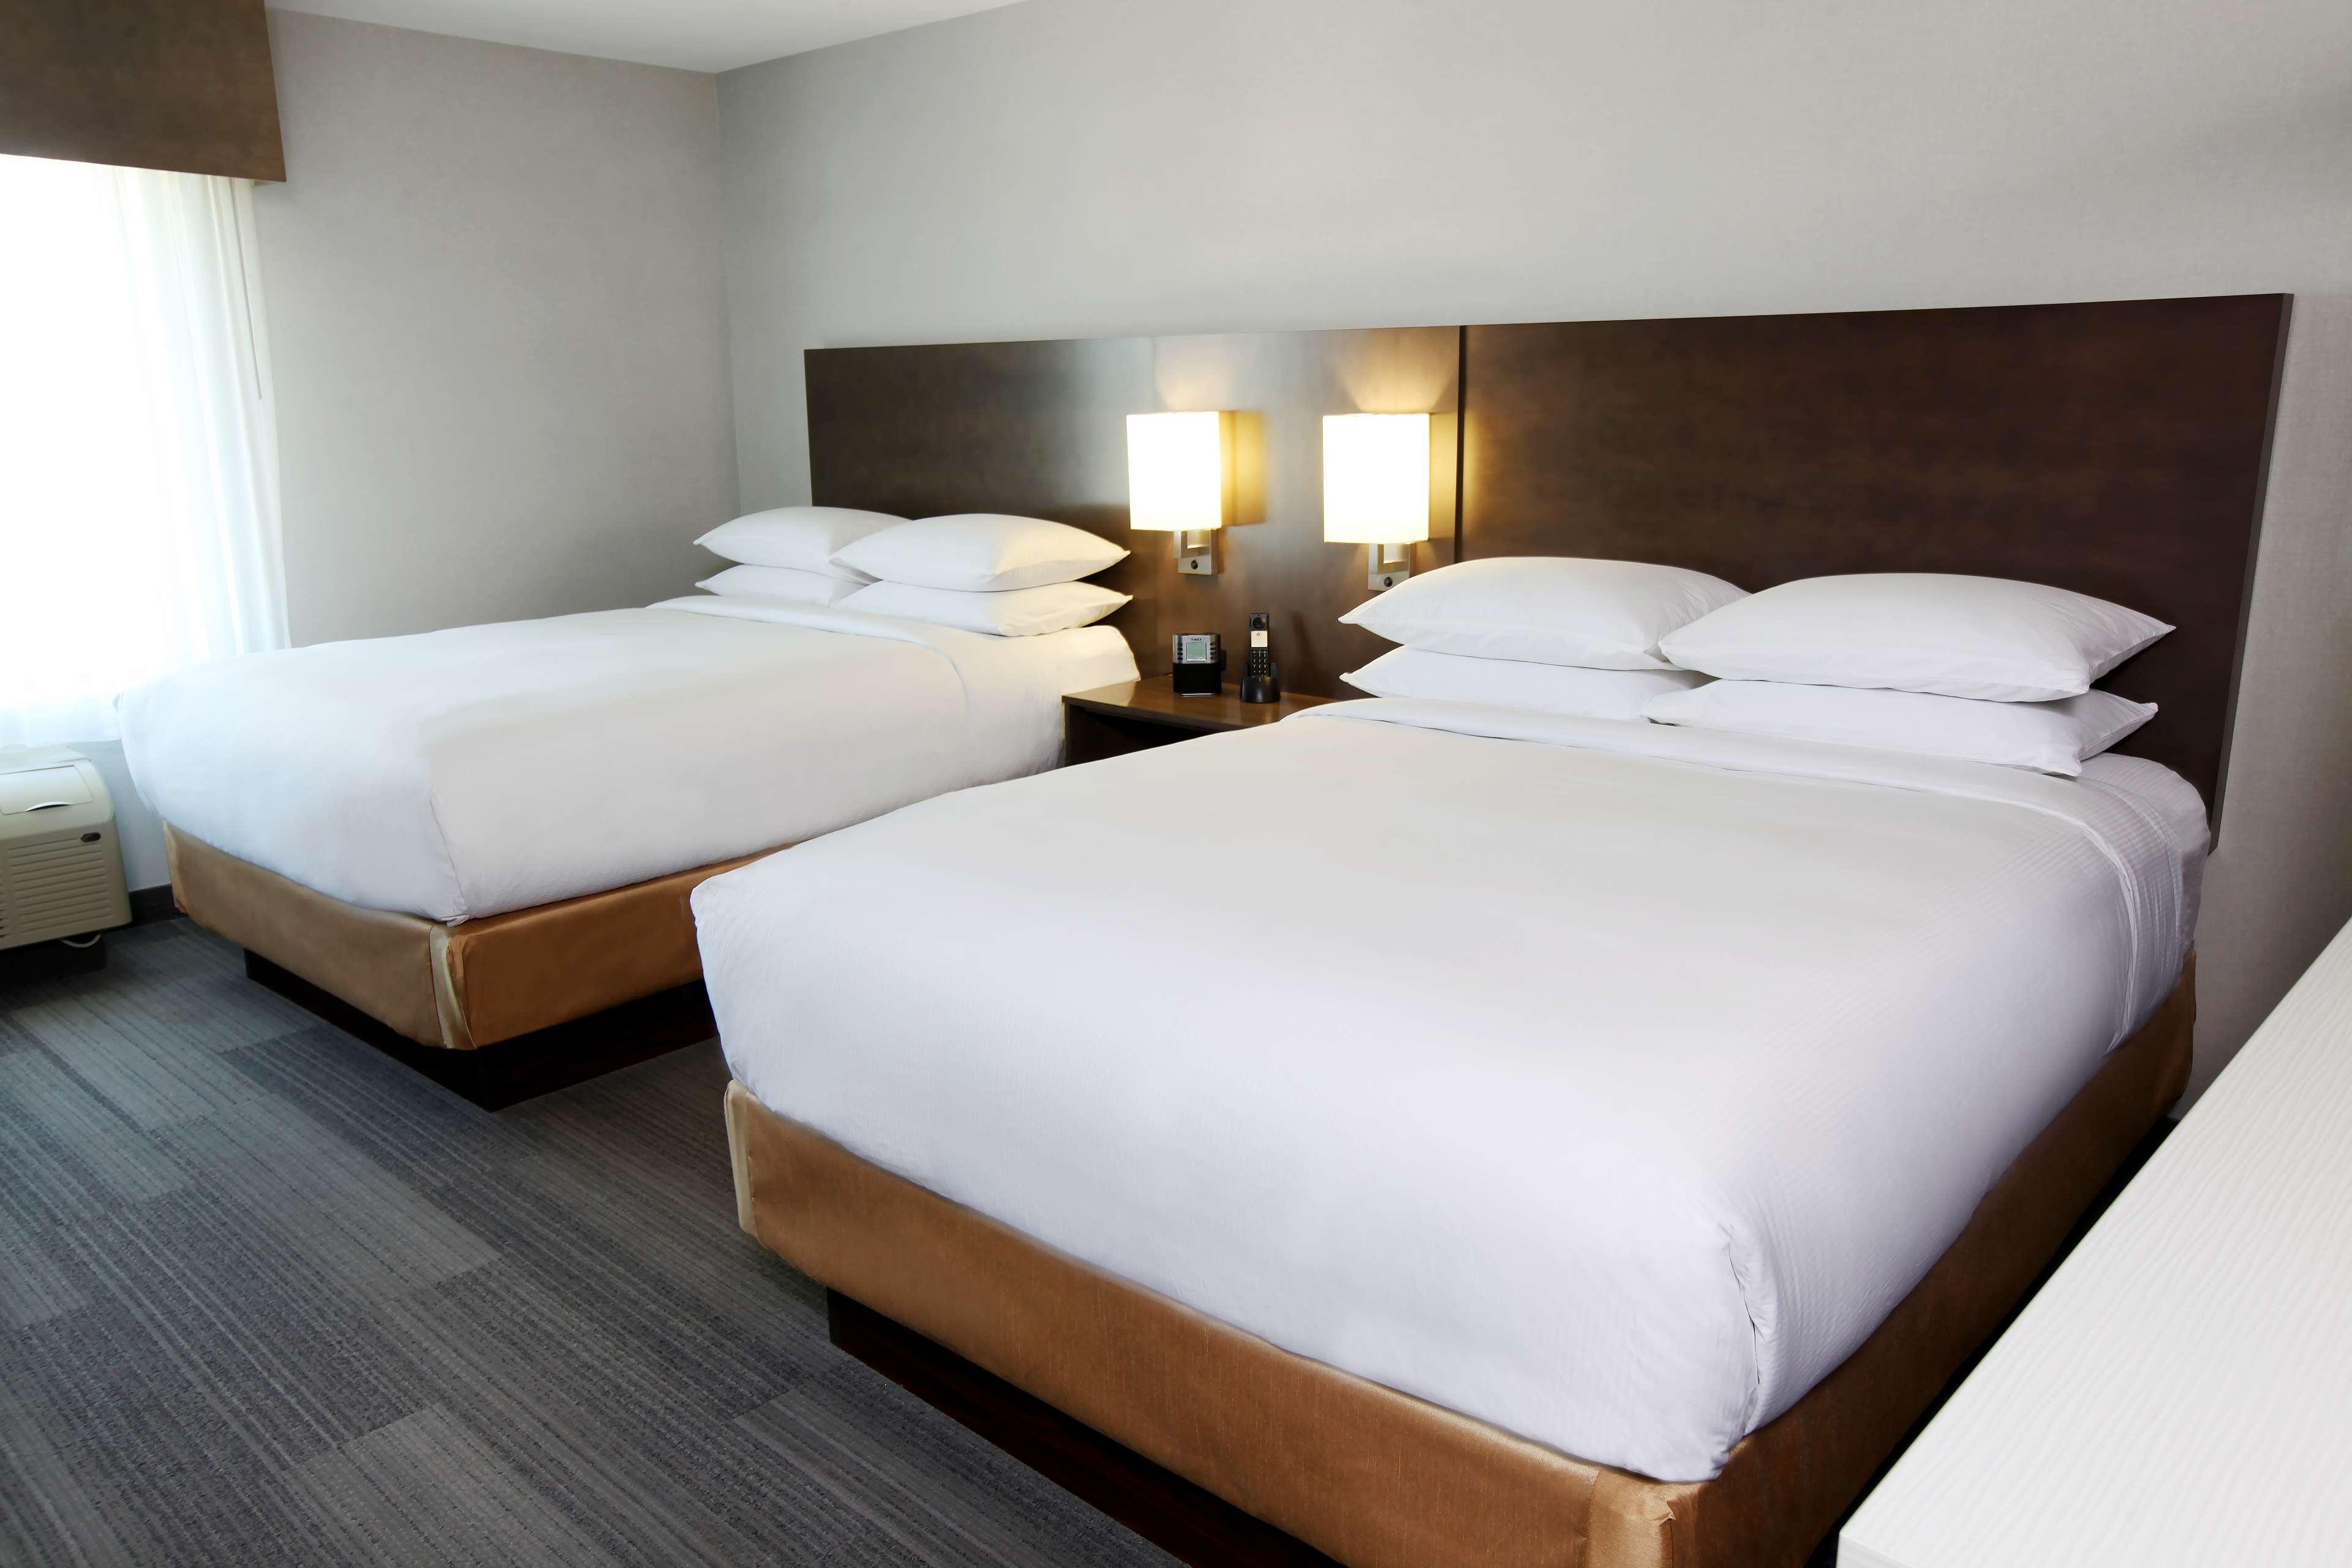 DoubleTree by Hilton West Fargo image 18